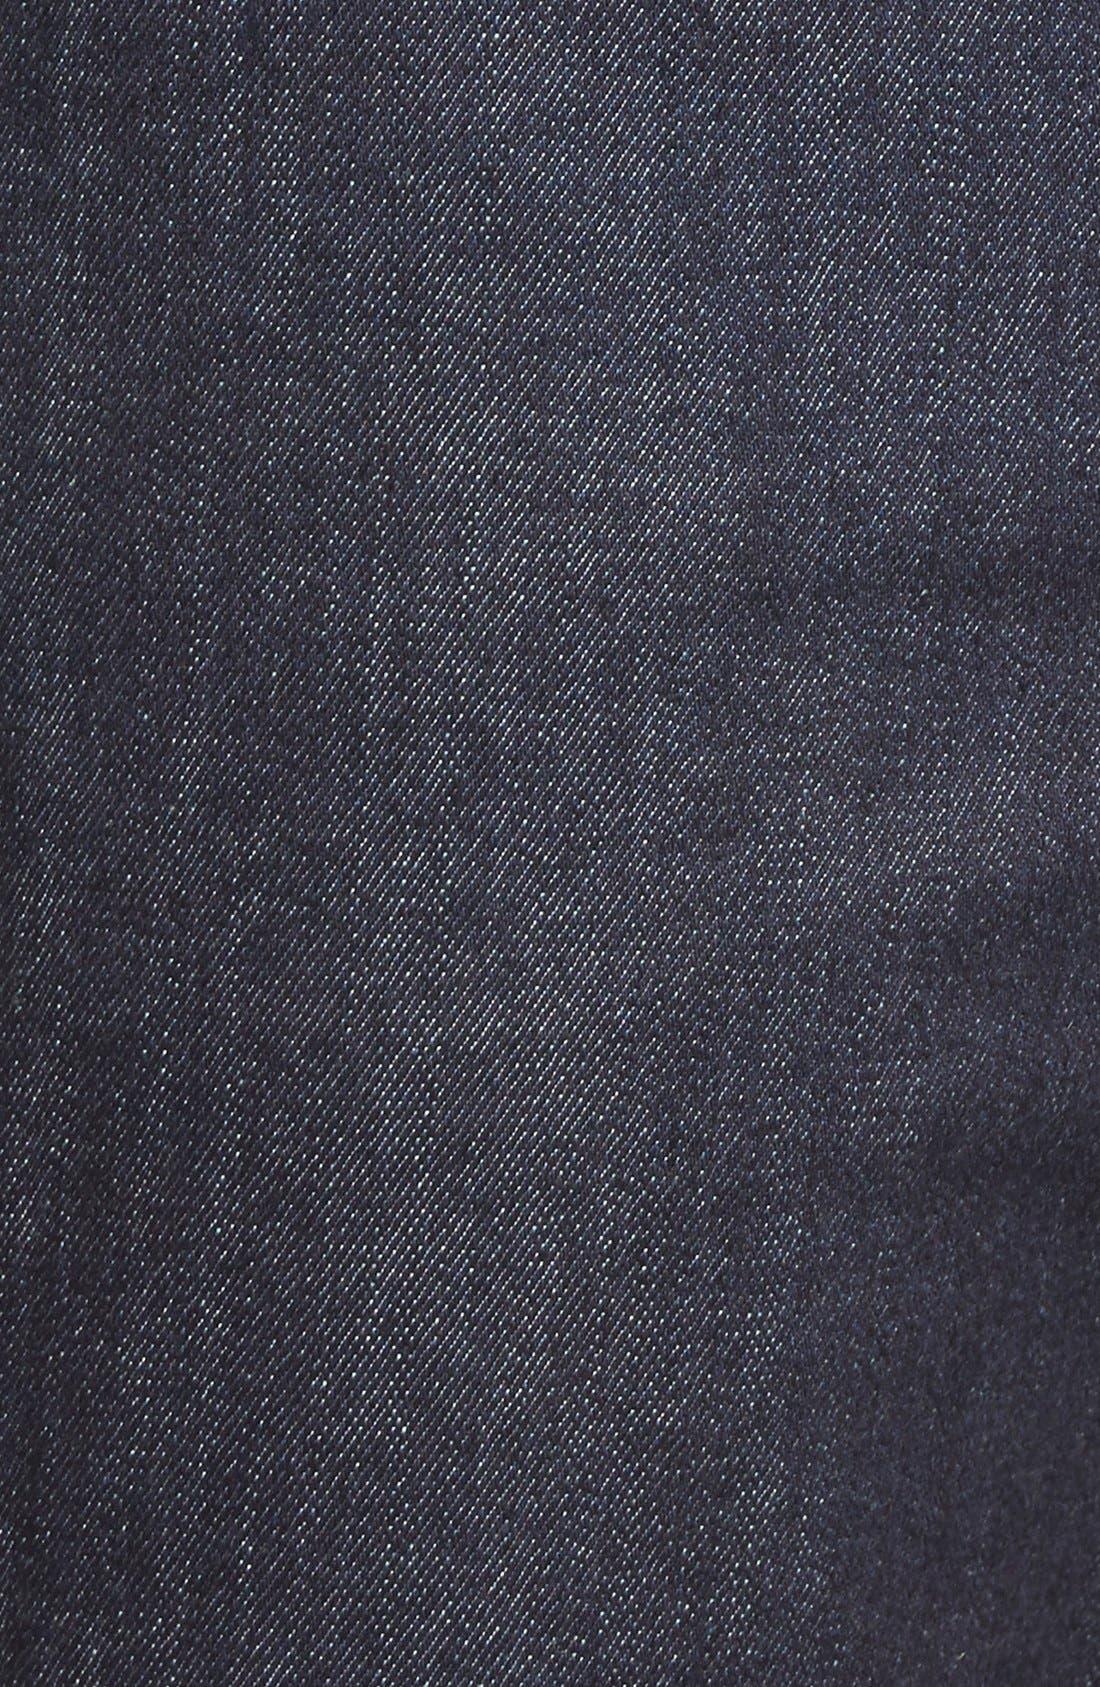 RAG & BONE, Standard Issue Fit 2 Slim Fit Jeans, Alternate thumbnail 8, color, TONAL RINSE